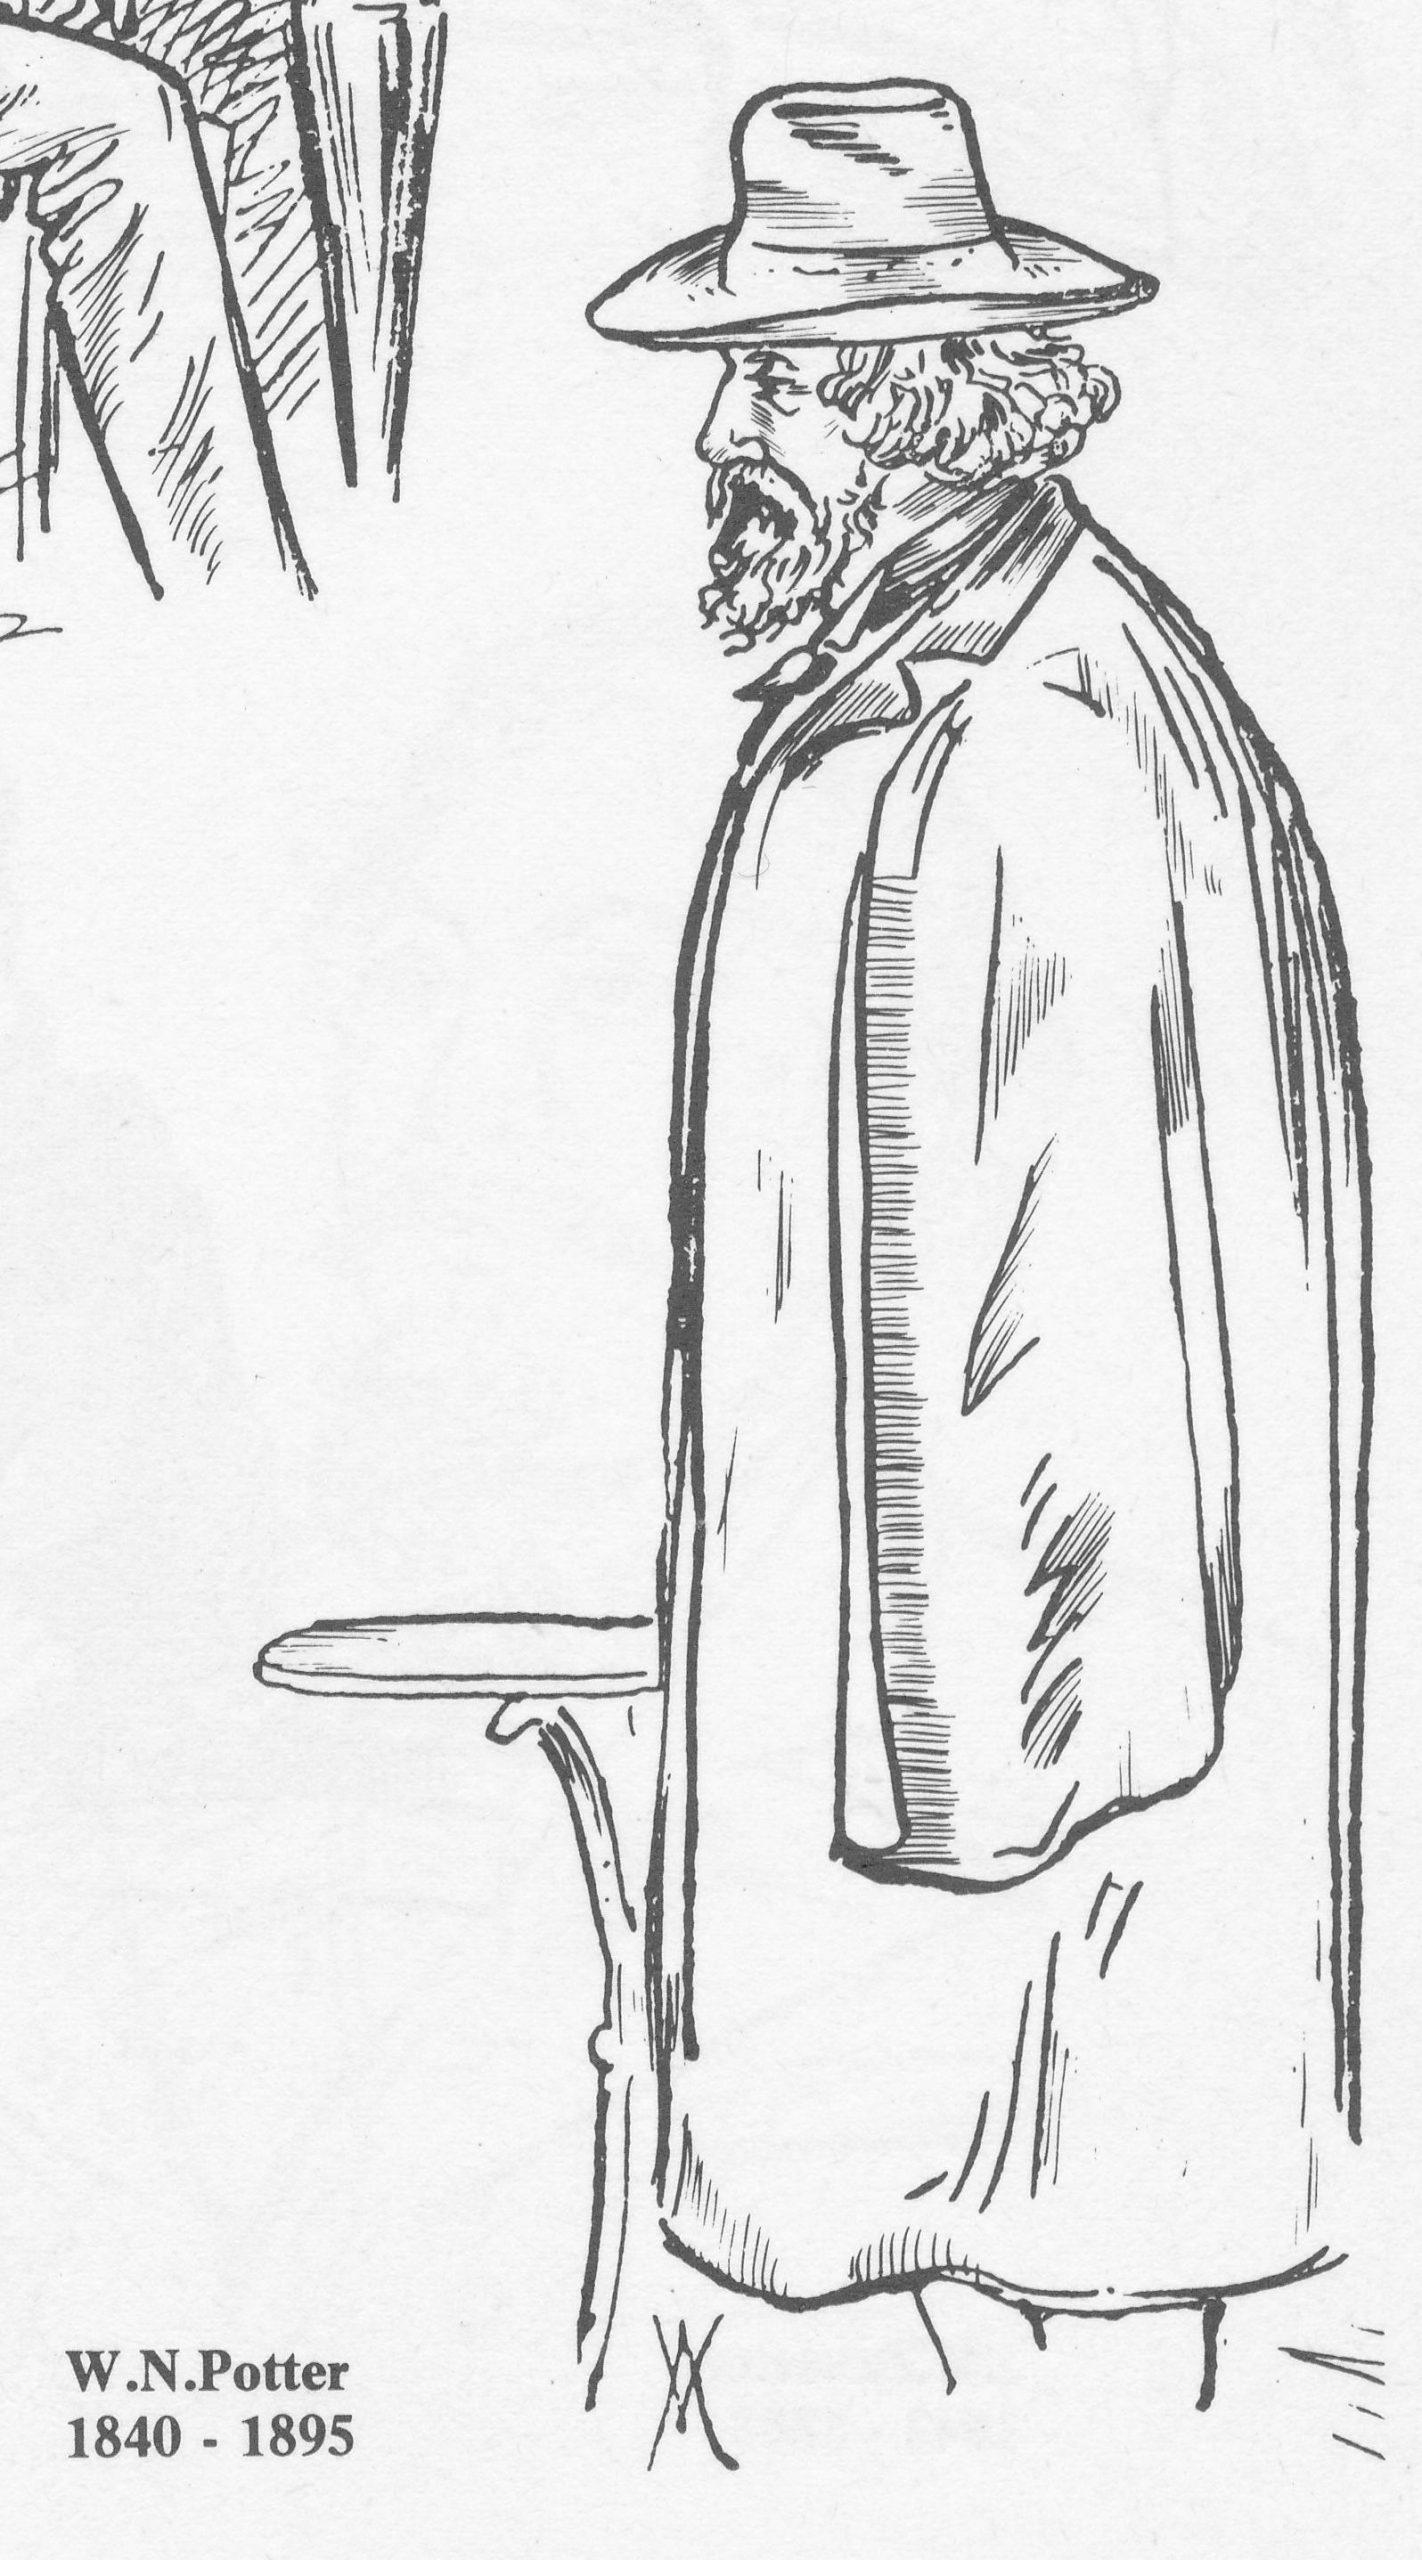 William Norwood Potter, (27-viii-1840 13-iii-1895) from Howard Staunton, The English World Chess Champion